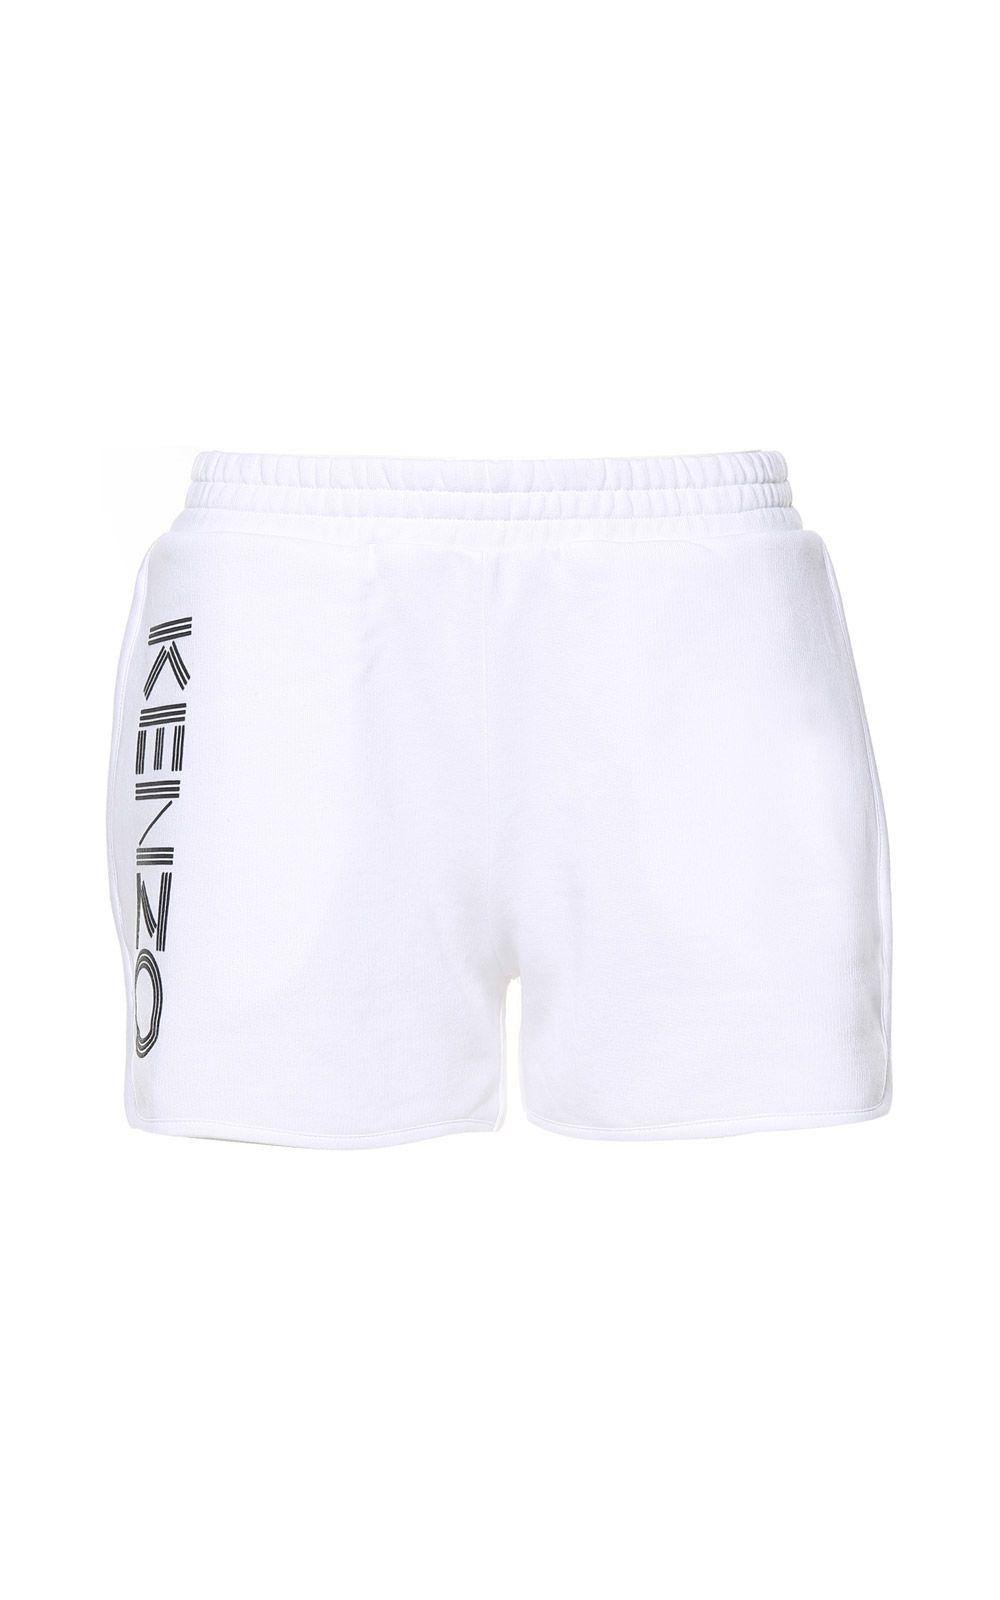 Kenzo Kenzo Paris Cotton-fleece Shorts